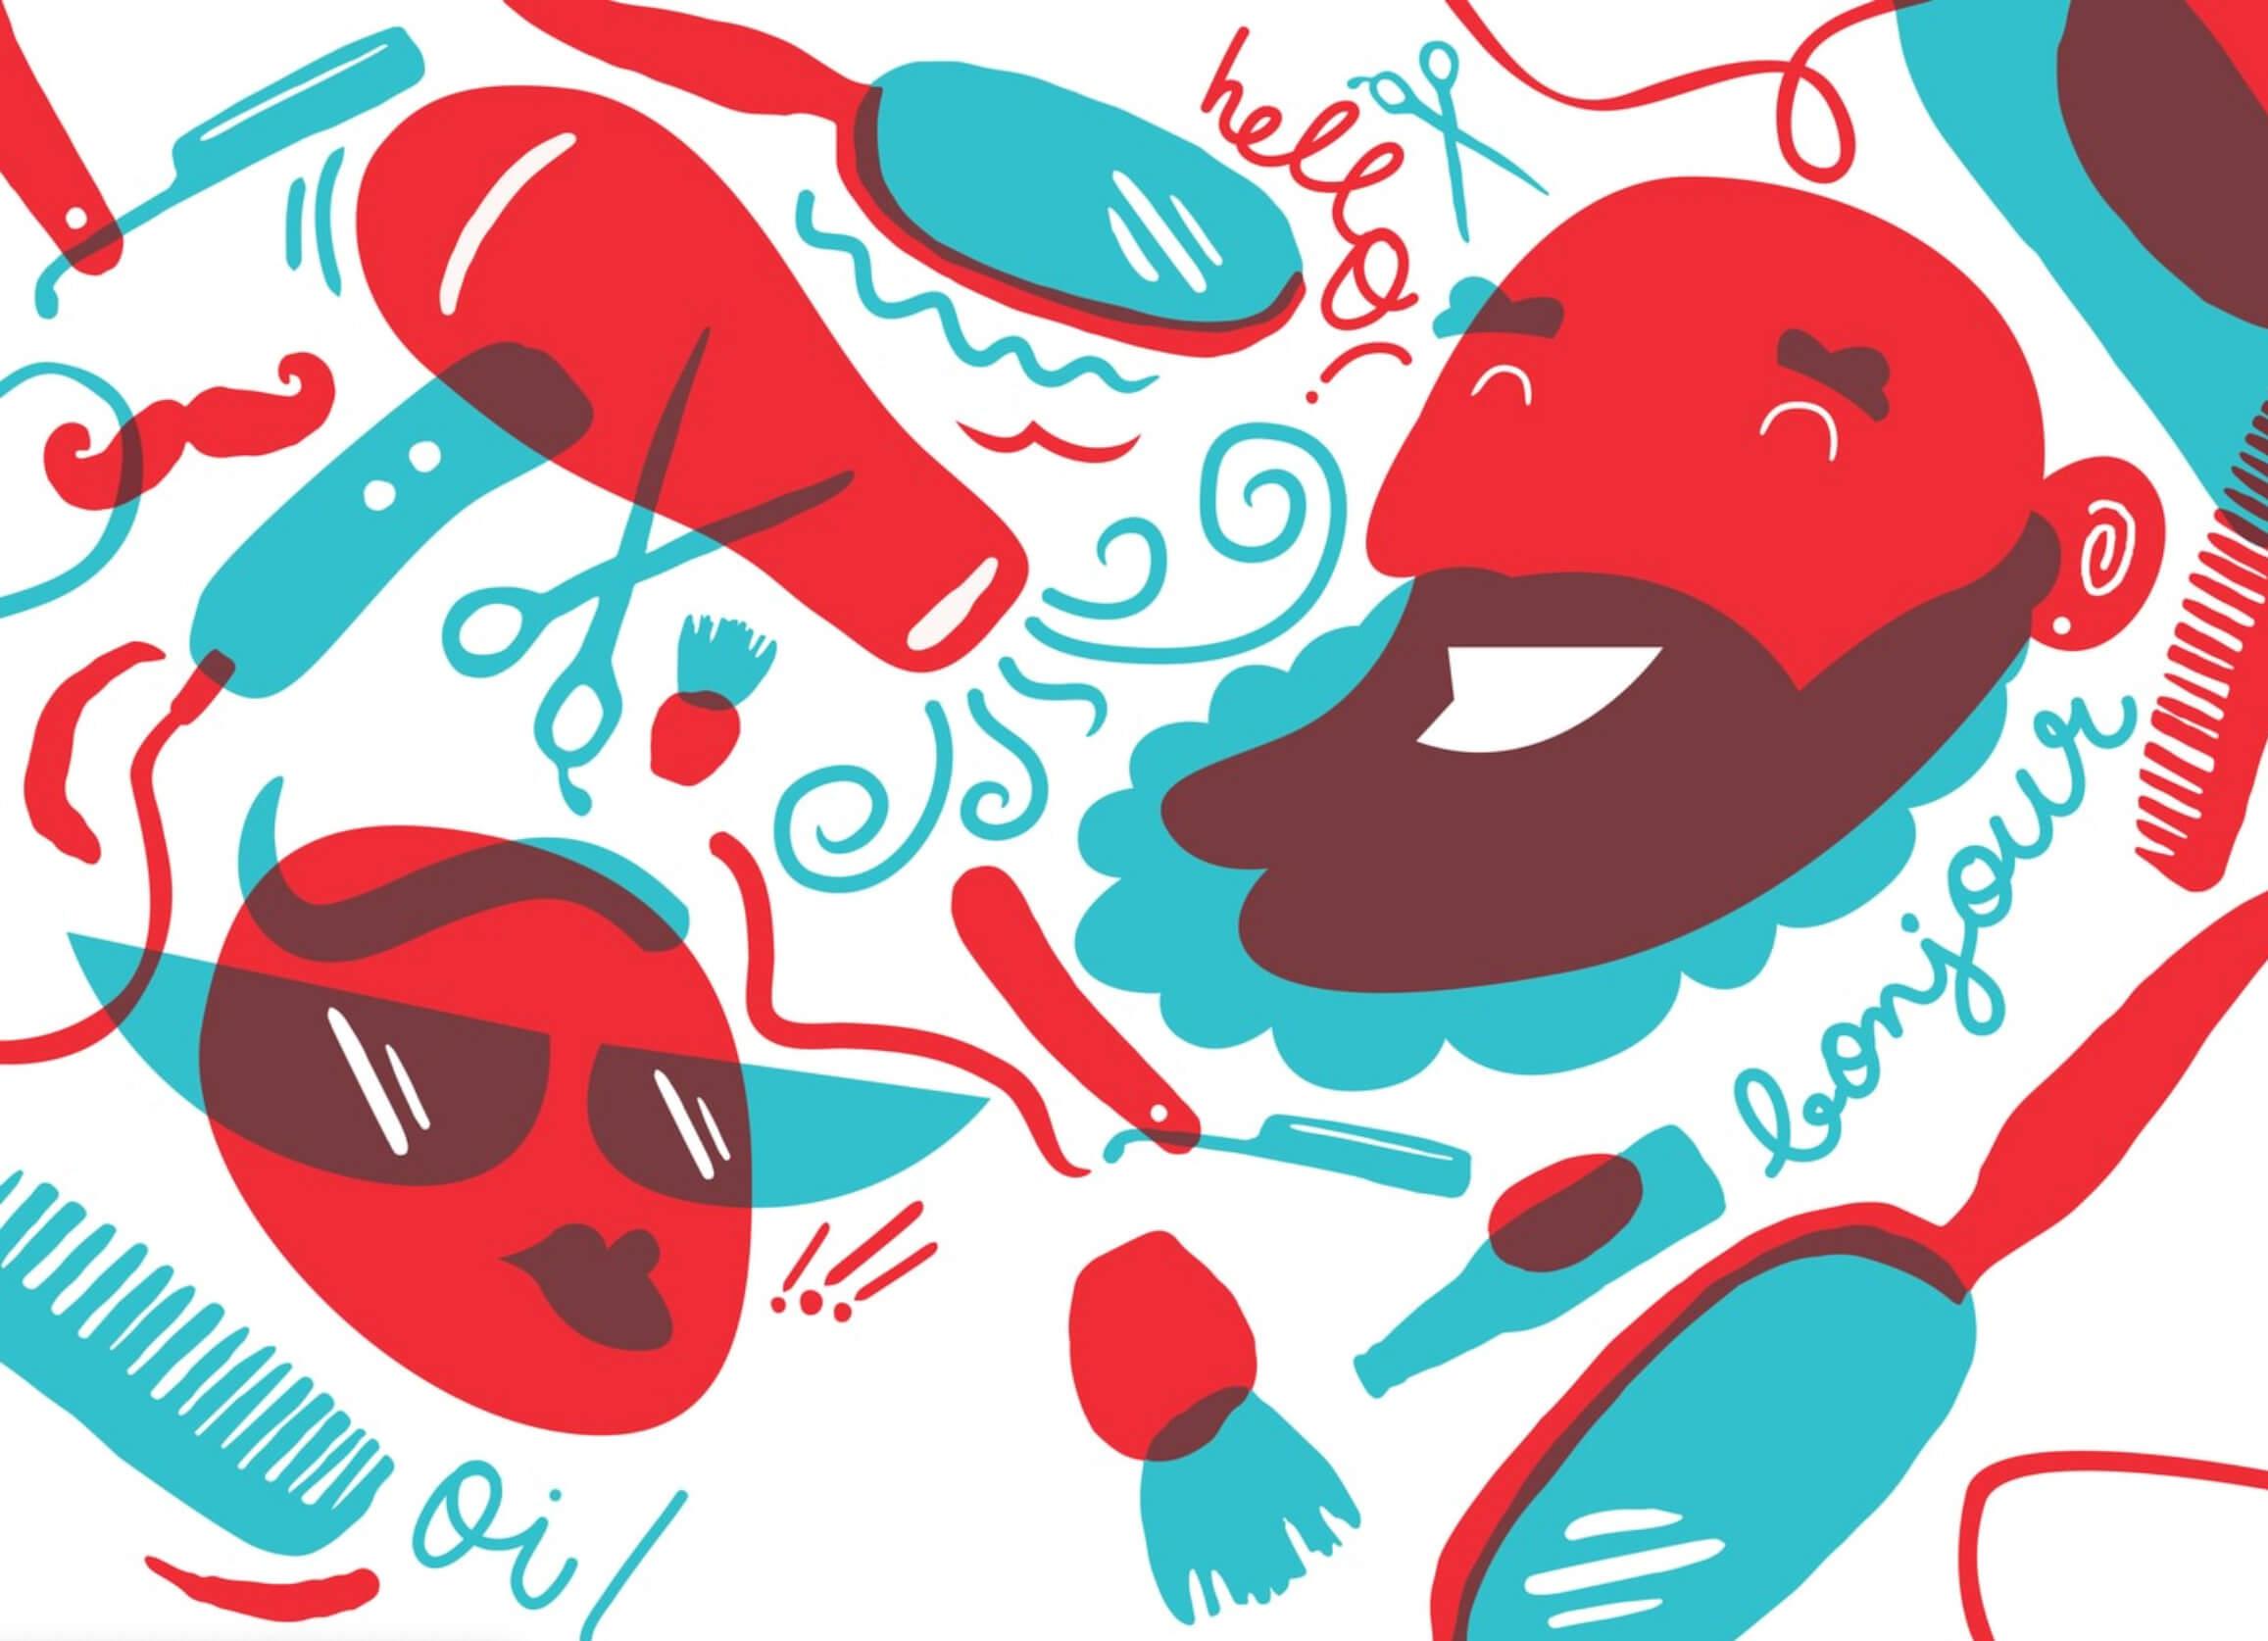 tiny_Lisbaeta_illustration1.jpg